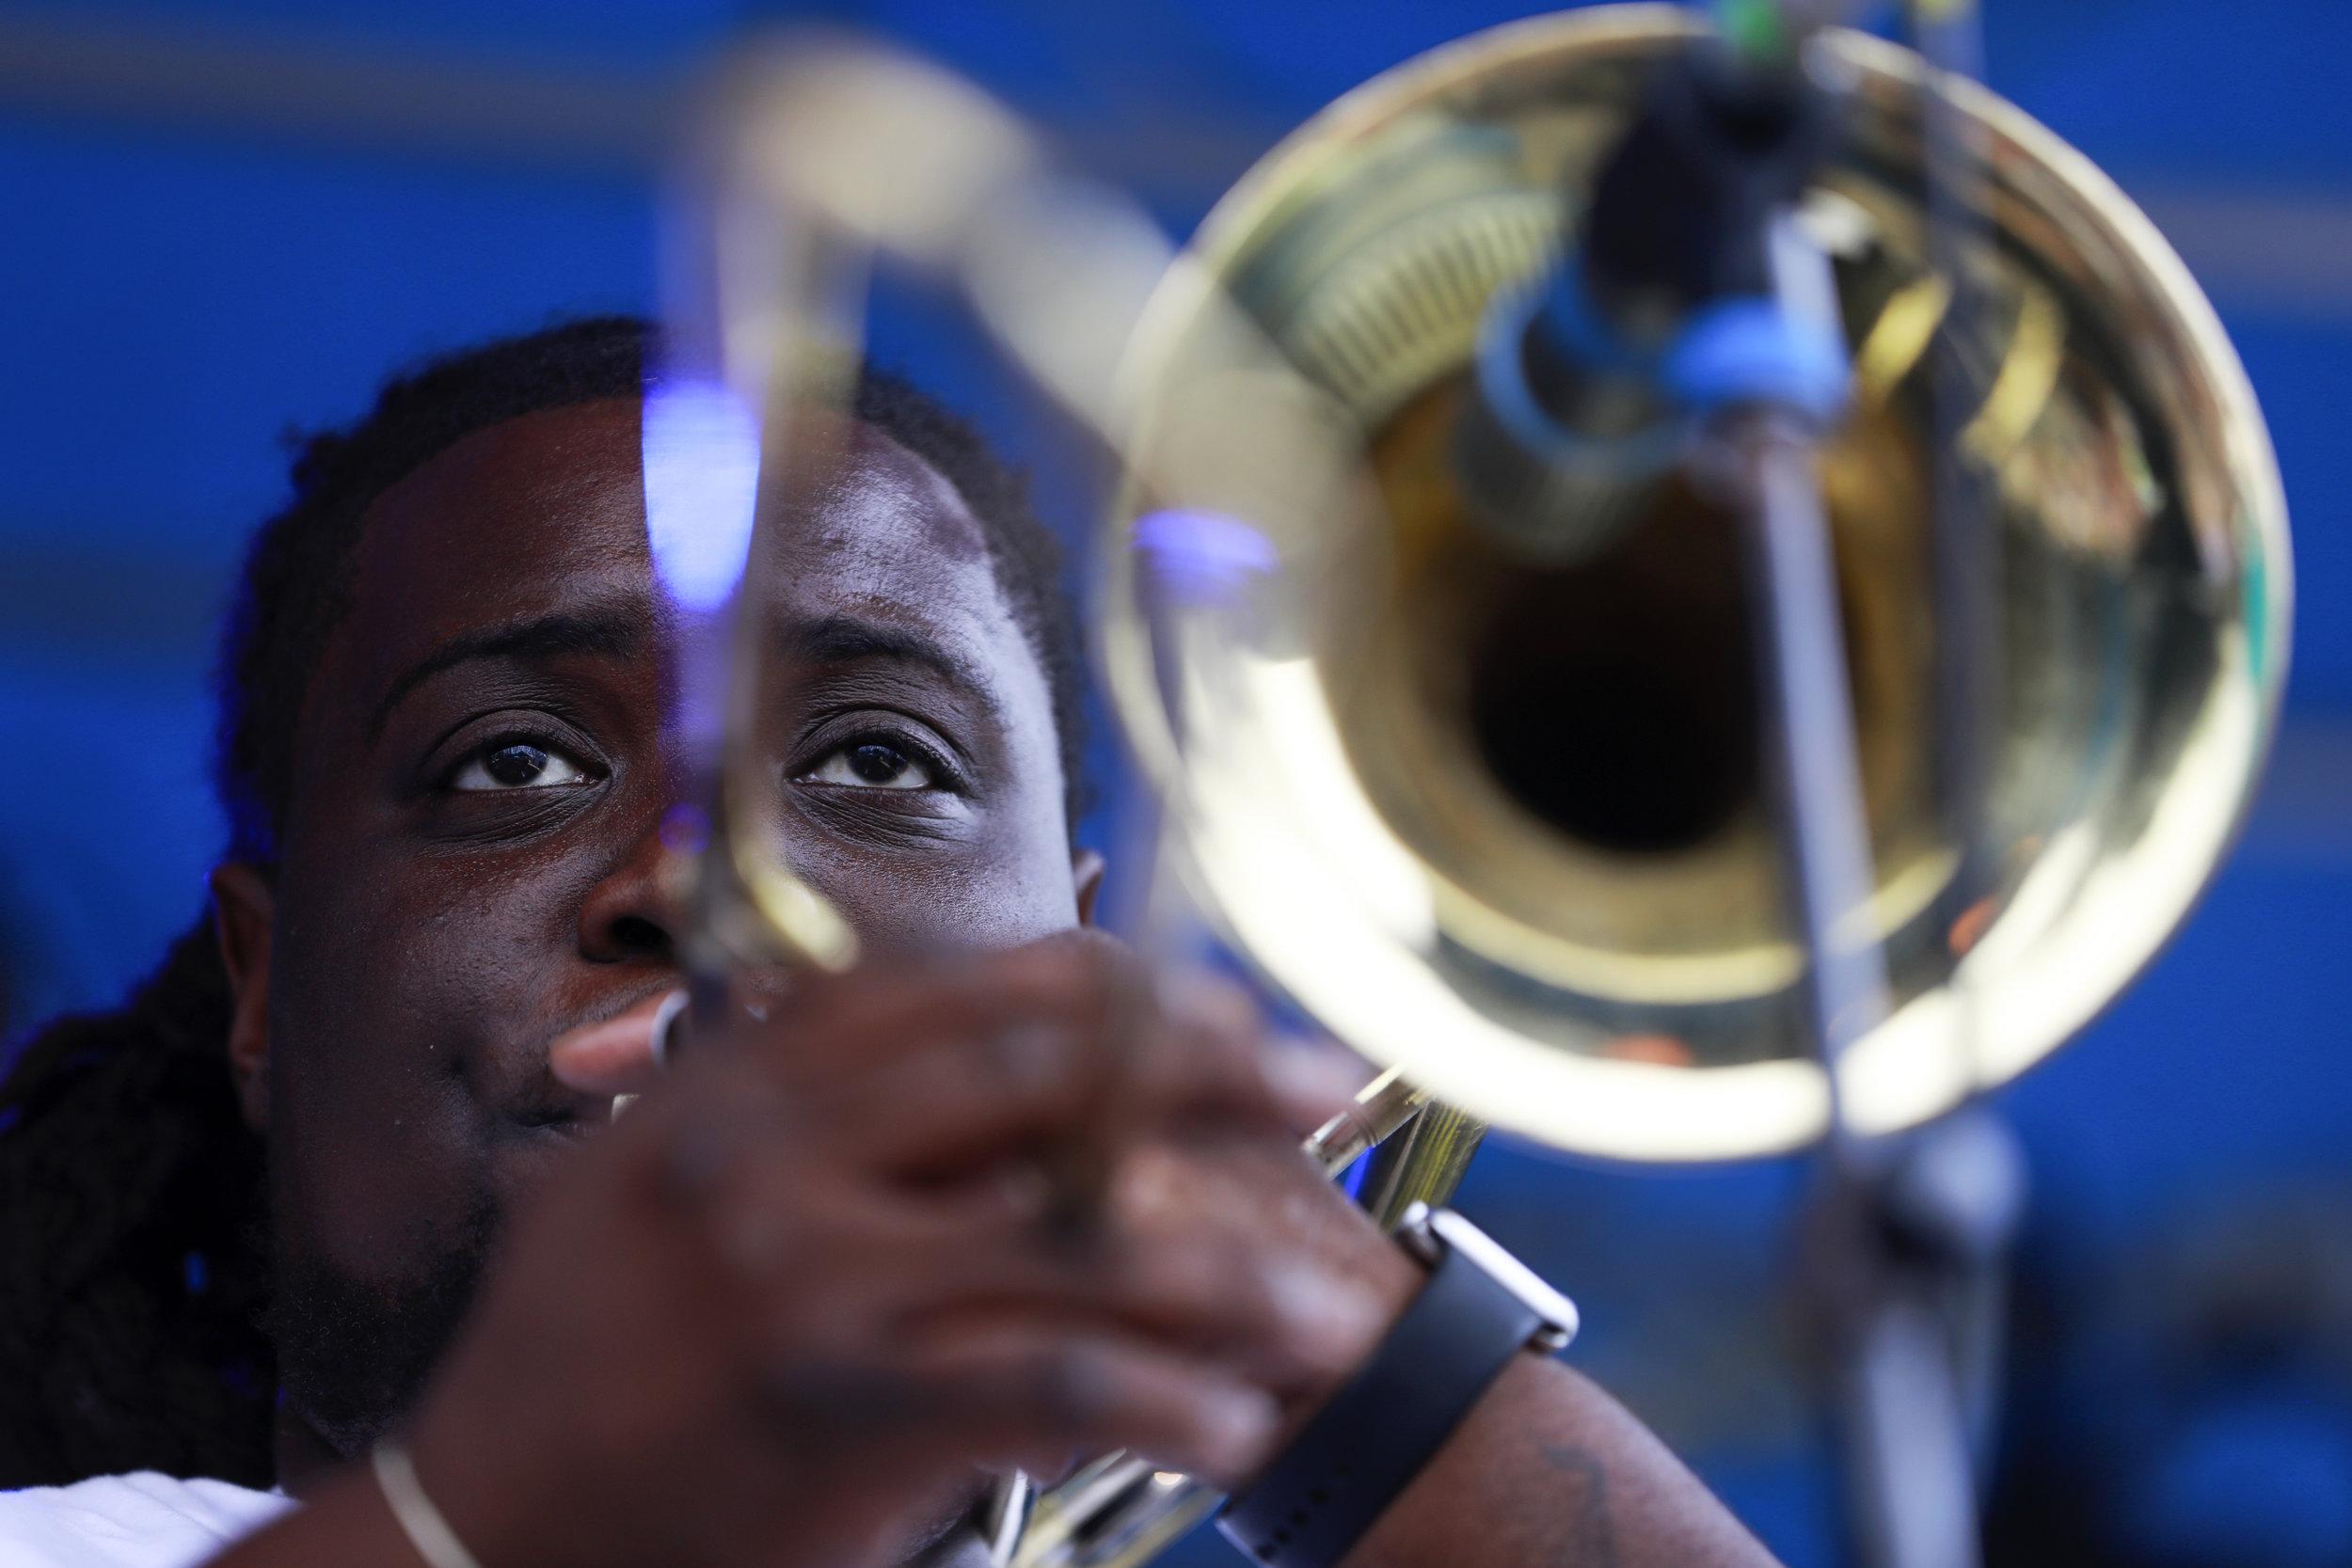 Hot 8 Brass band (Photo Credit: Aly McClaran)